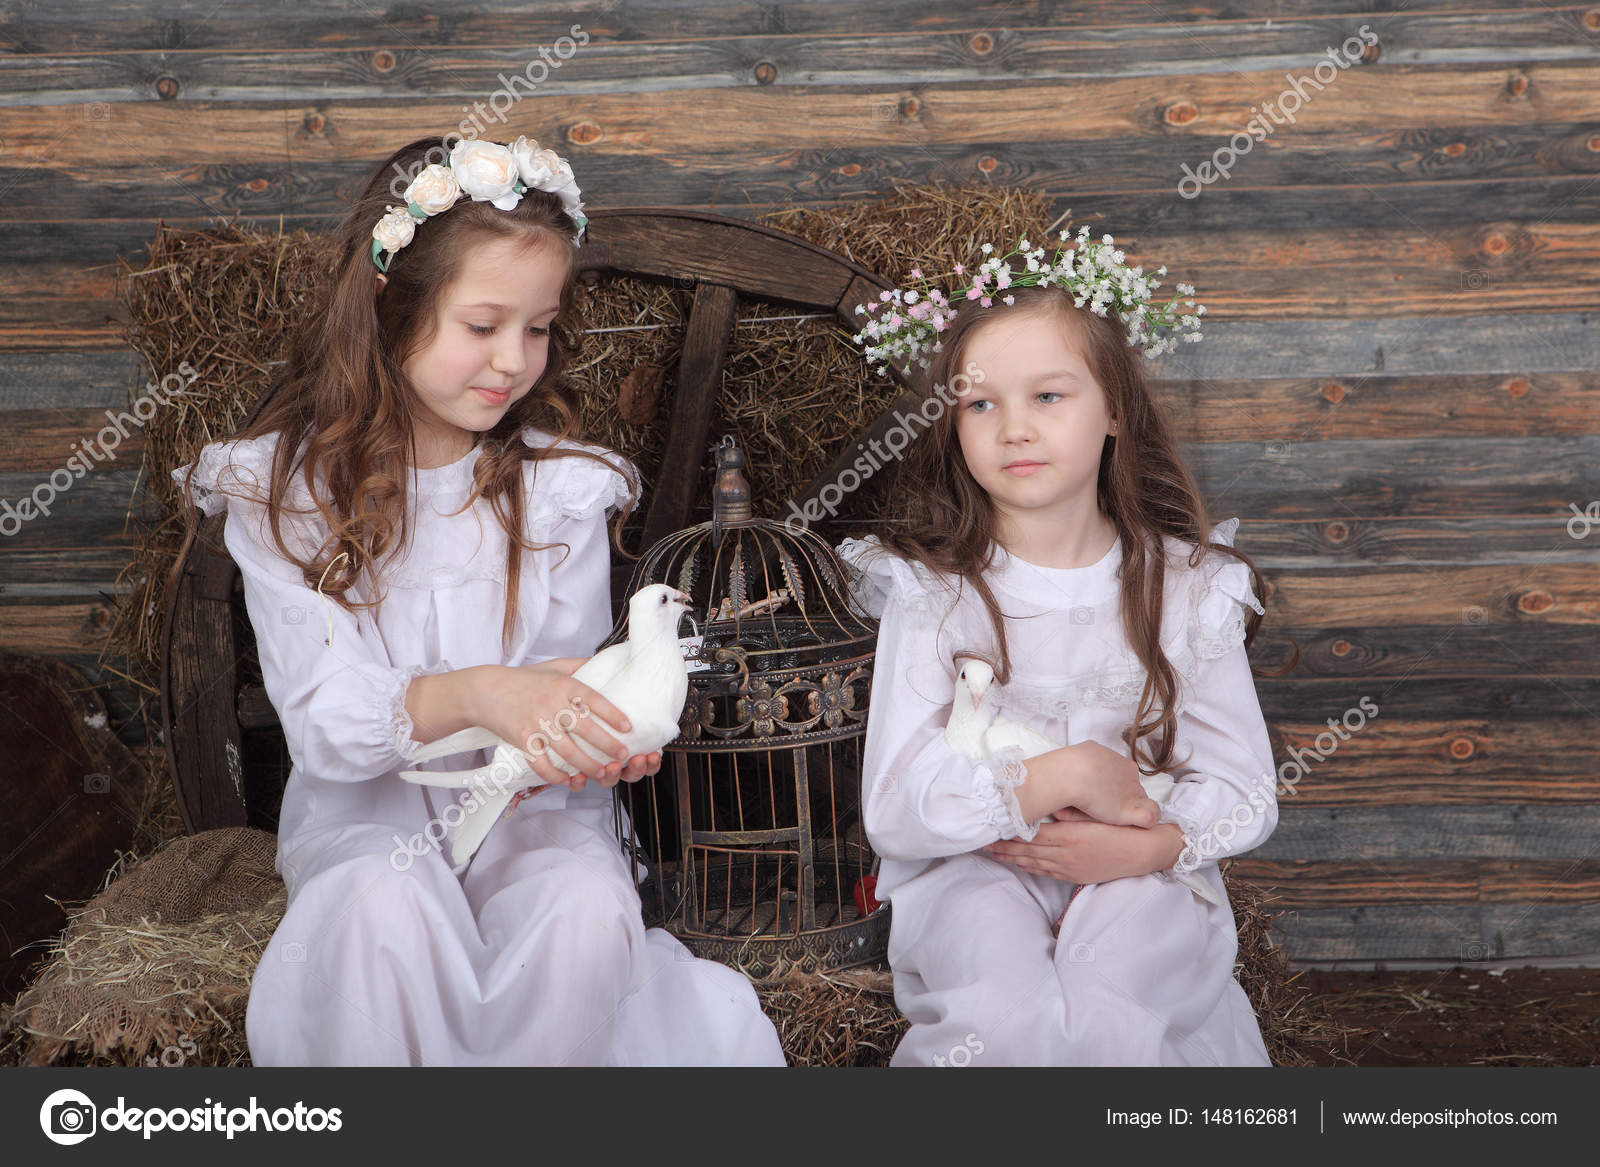 f3d79af487d4 Δύο κορίτσια φίλες διεξάγουμε μια ζωντανή πάπια και ένα pigeo — Εικόνα από  ...